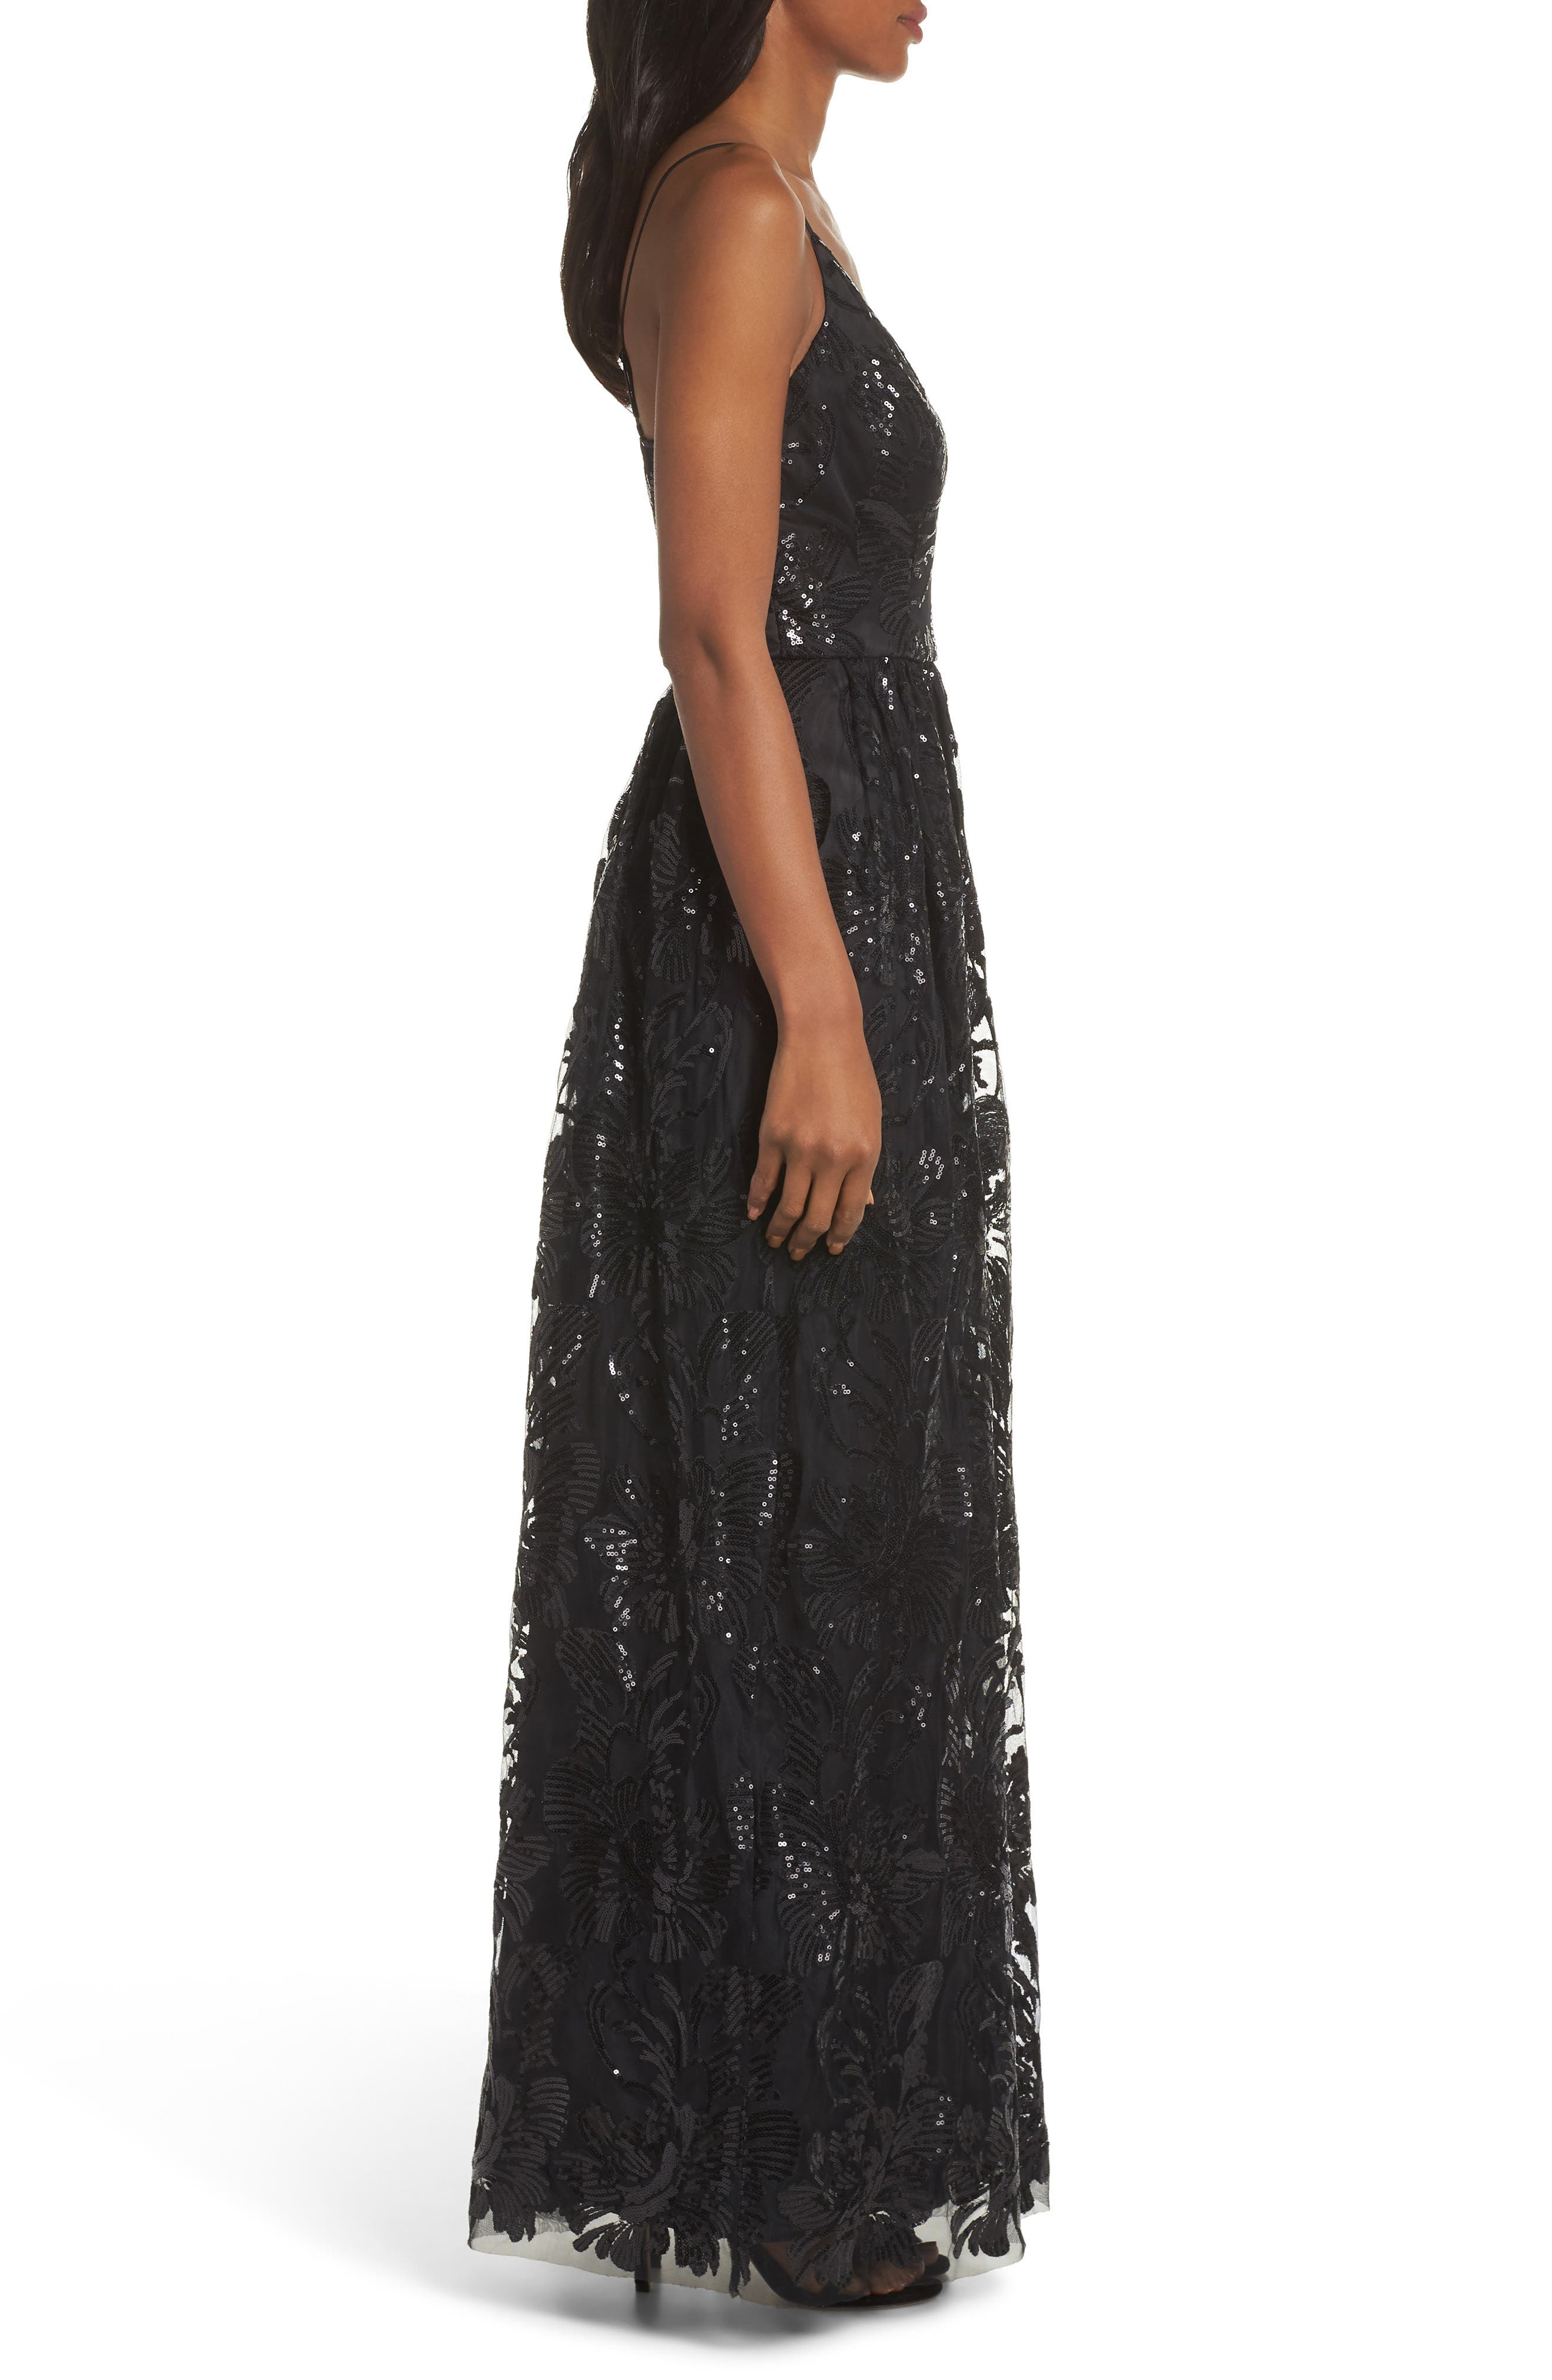 ELIZA J, Sequin Embroidered Mesh Evening Dress, Alternate thumbnail 4, color, BLACK